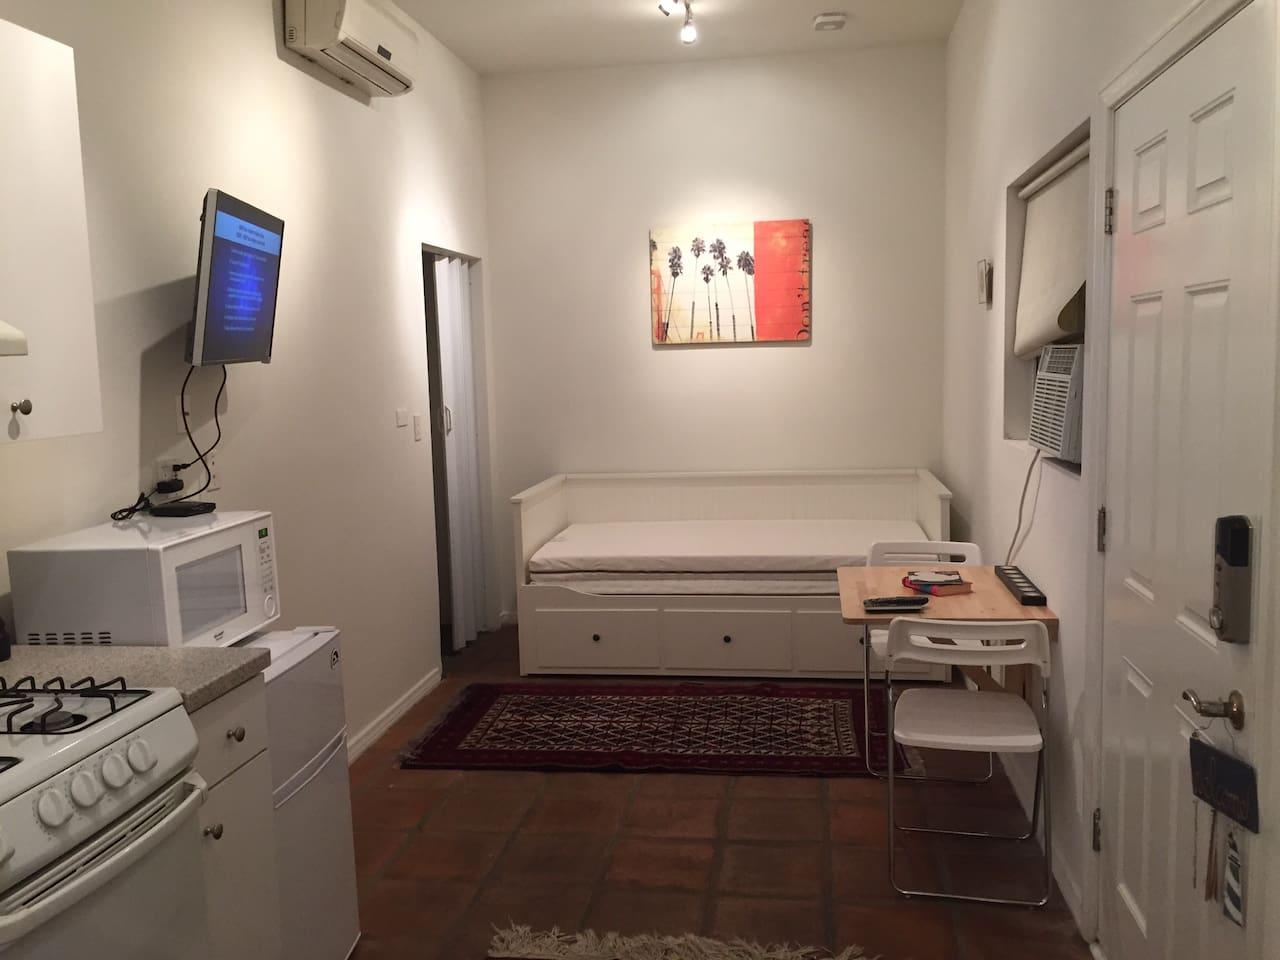 Melrose Area/Grove - Bright & Roomy